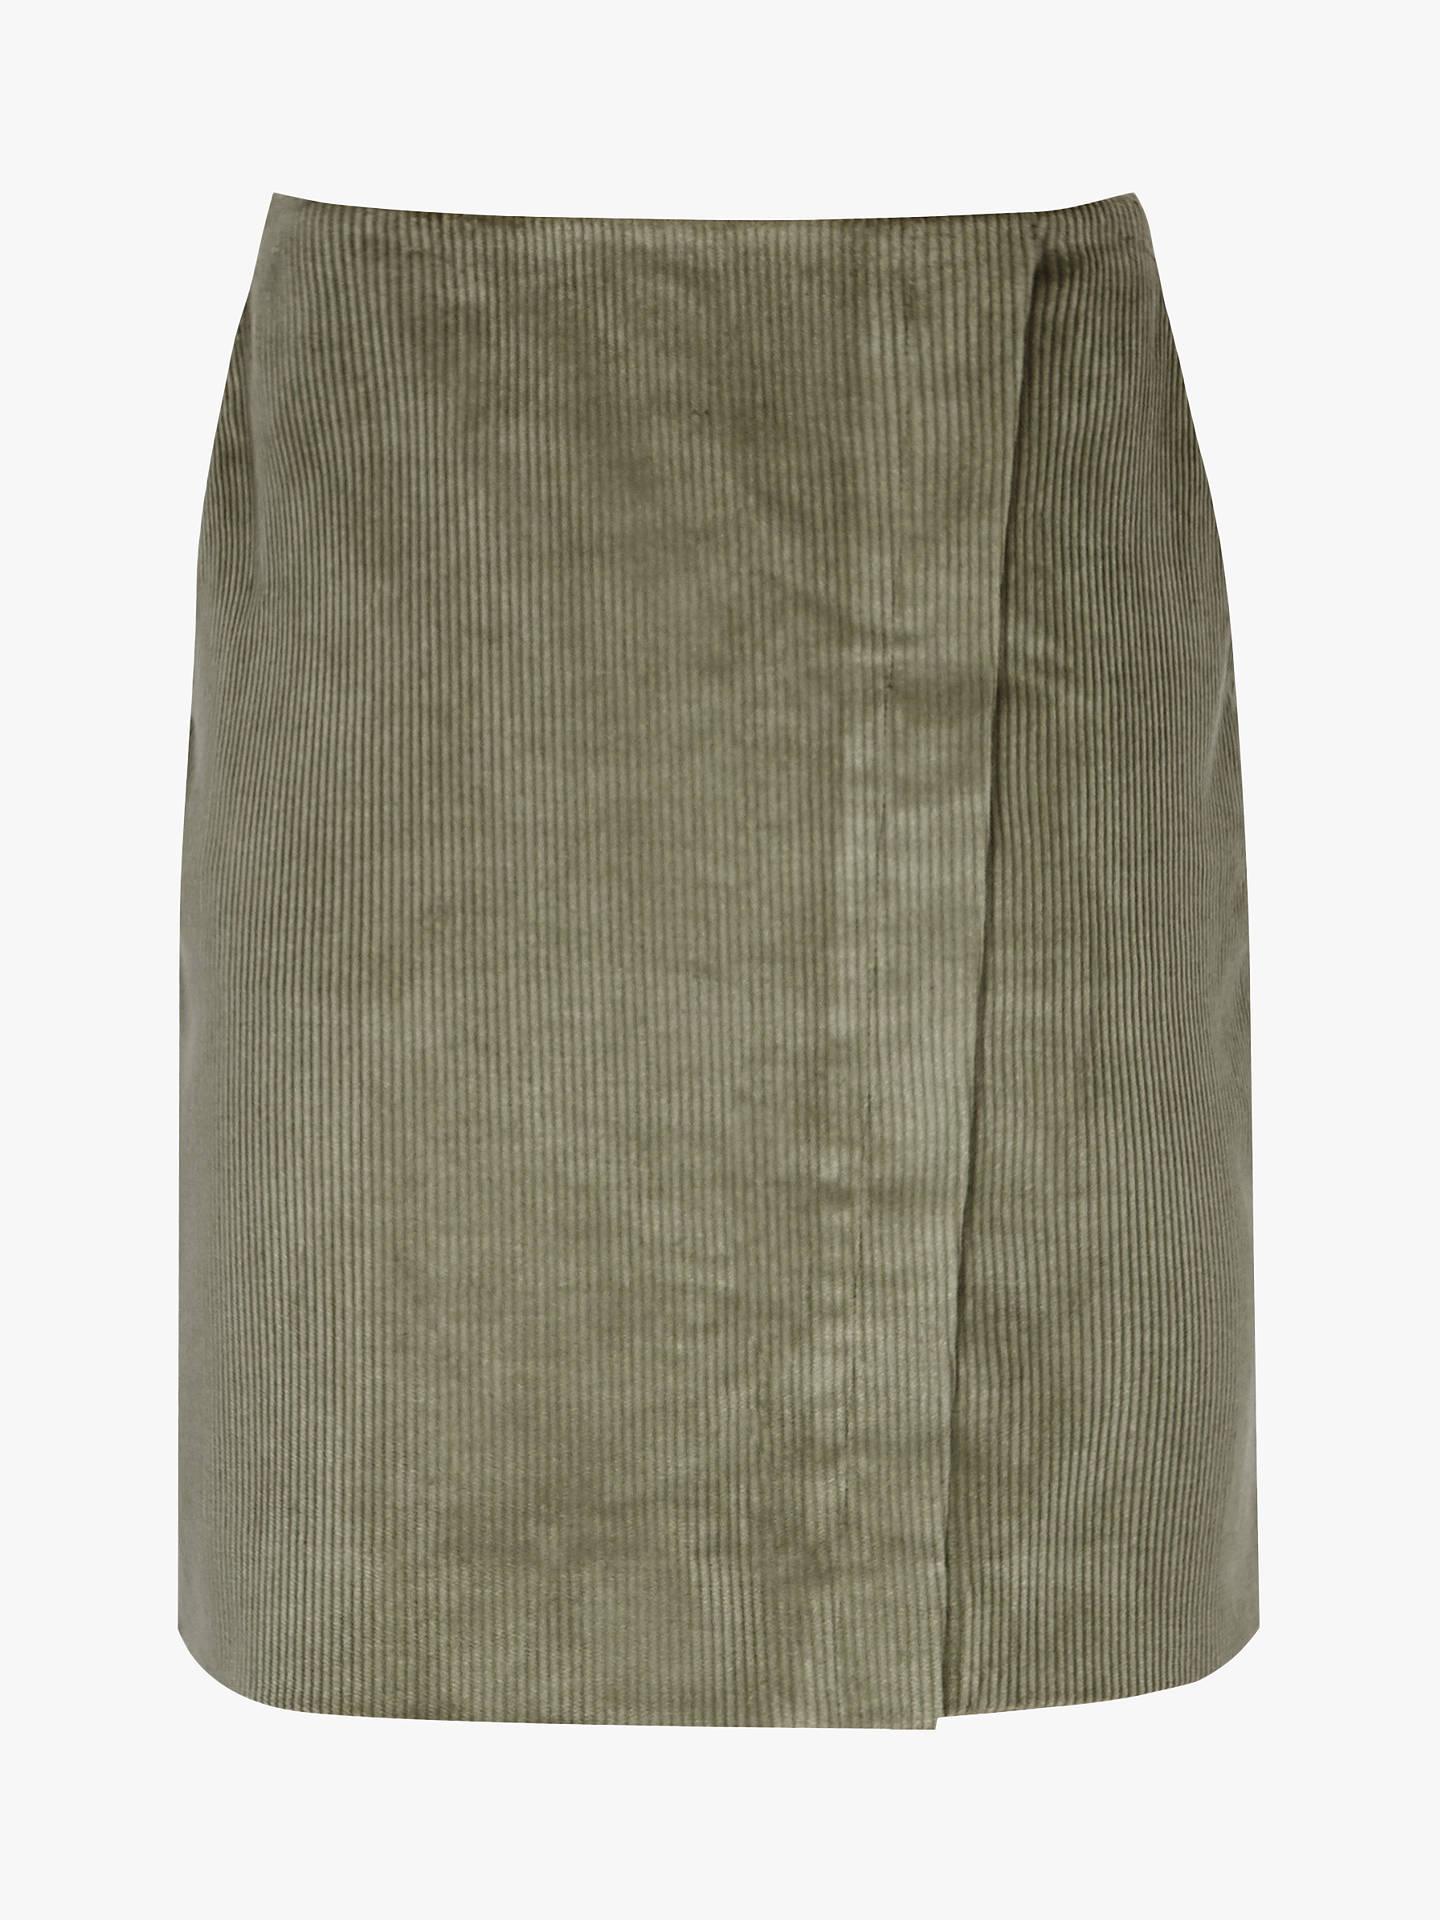 c9311ea0d7 ... Buy Reiss Francis Corduroy Mini Skirt, Green Mid, 8 Online at  johnlewis.com ...